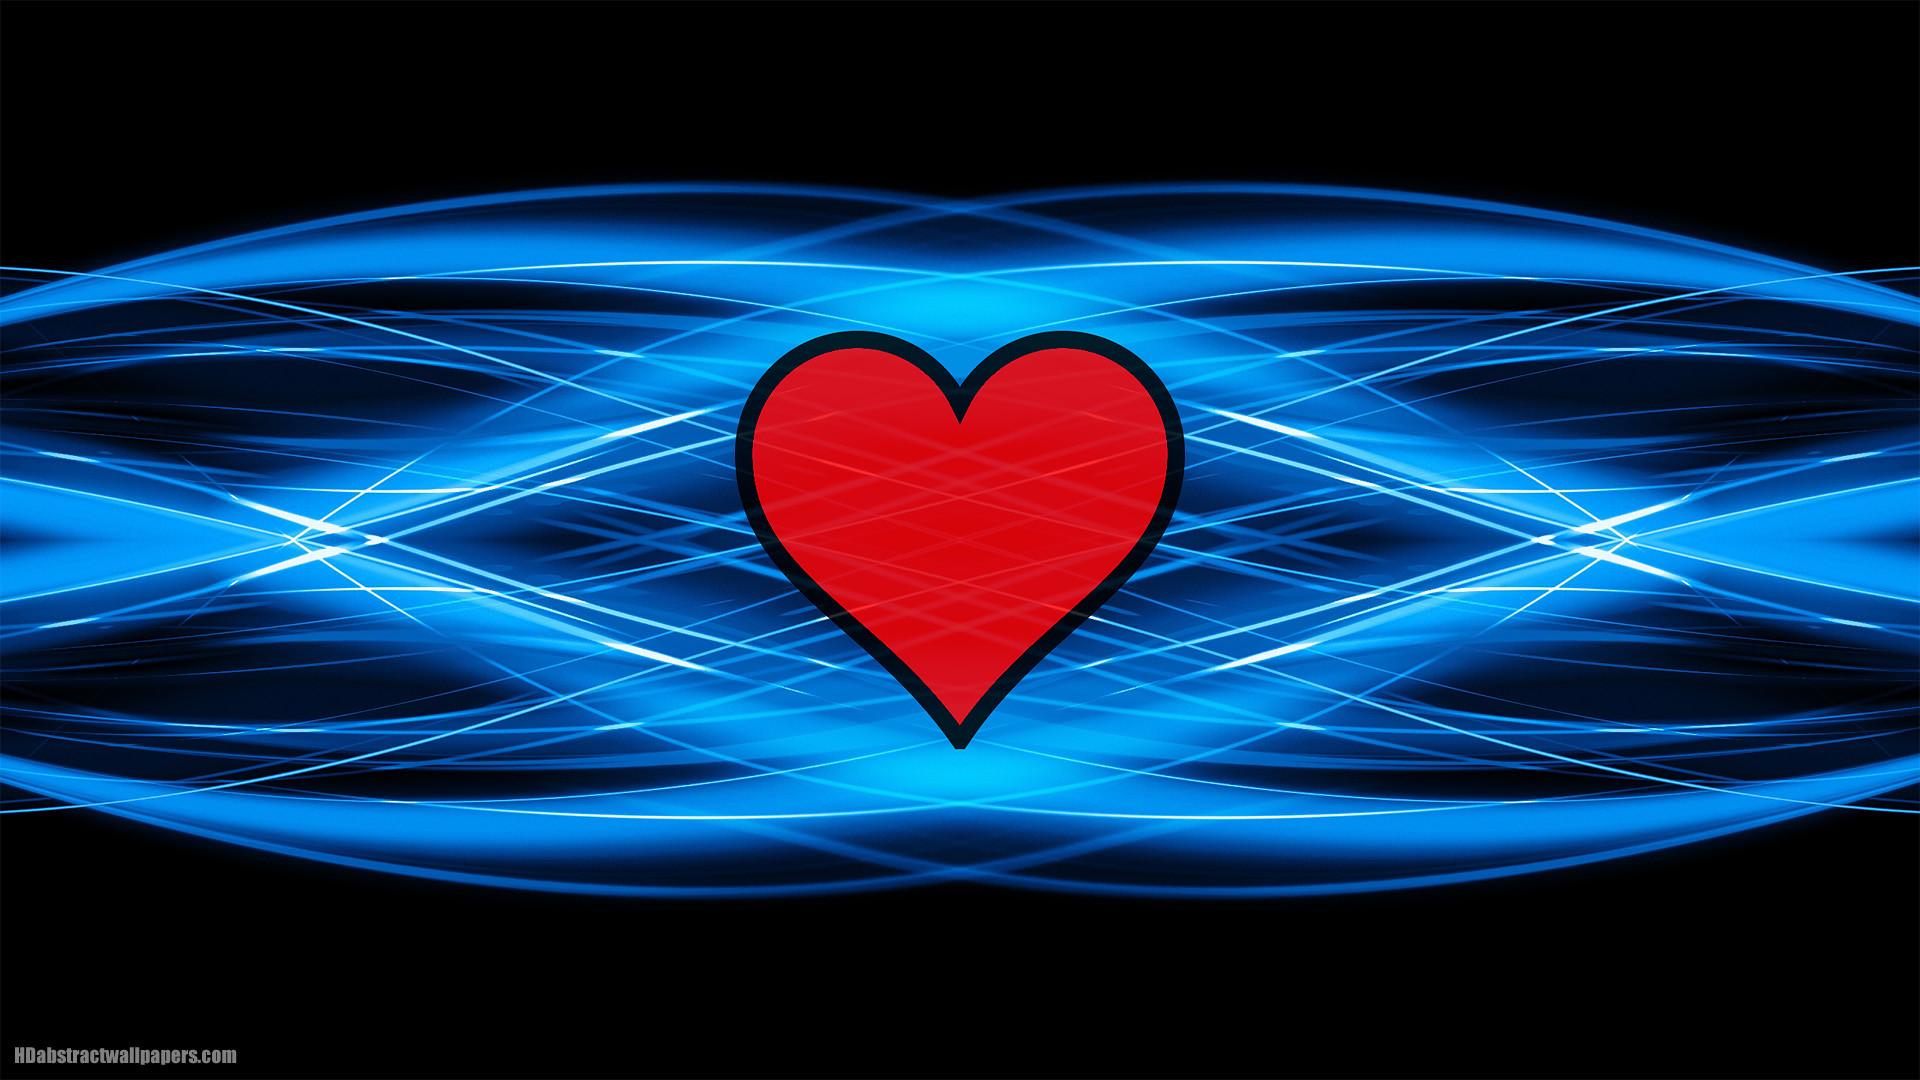 blue heart wallpaper (70+ images)